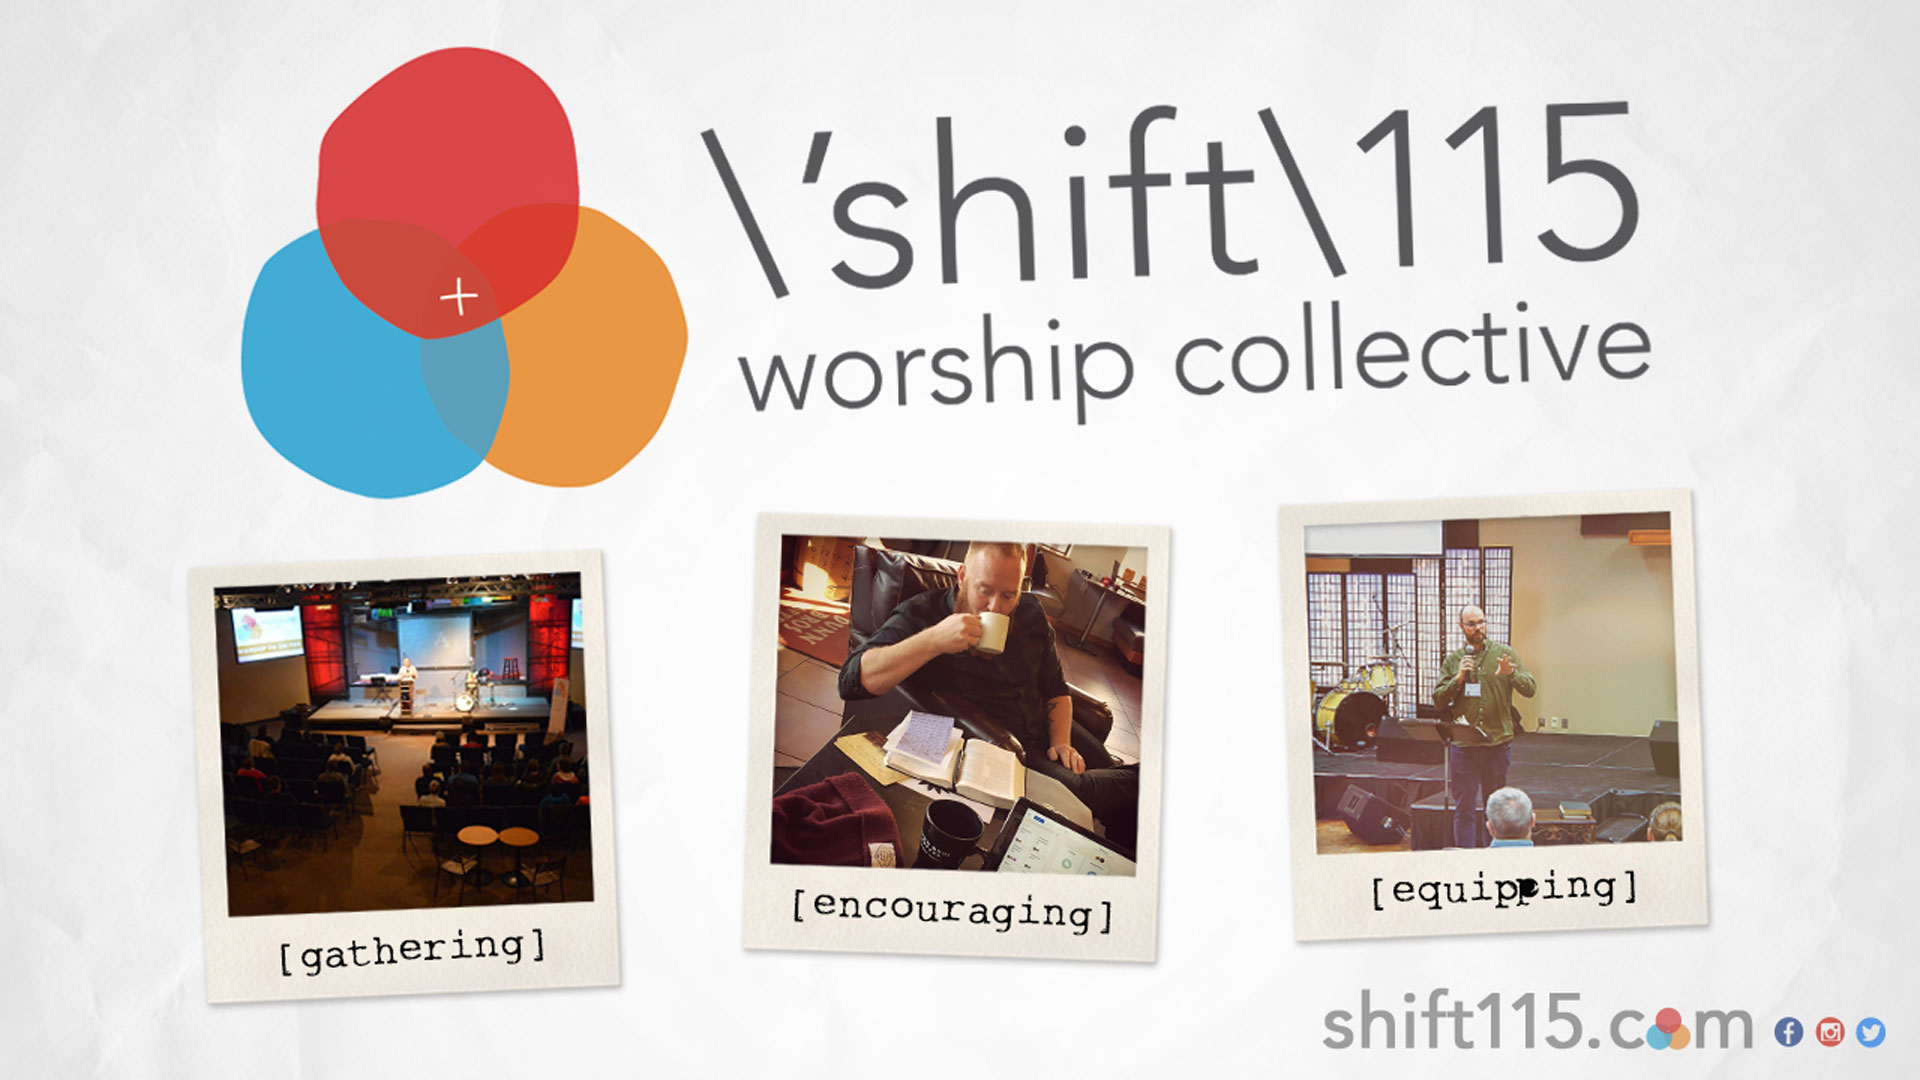 Shift115-Screen-1920x1080-widescreen.jpg